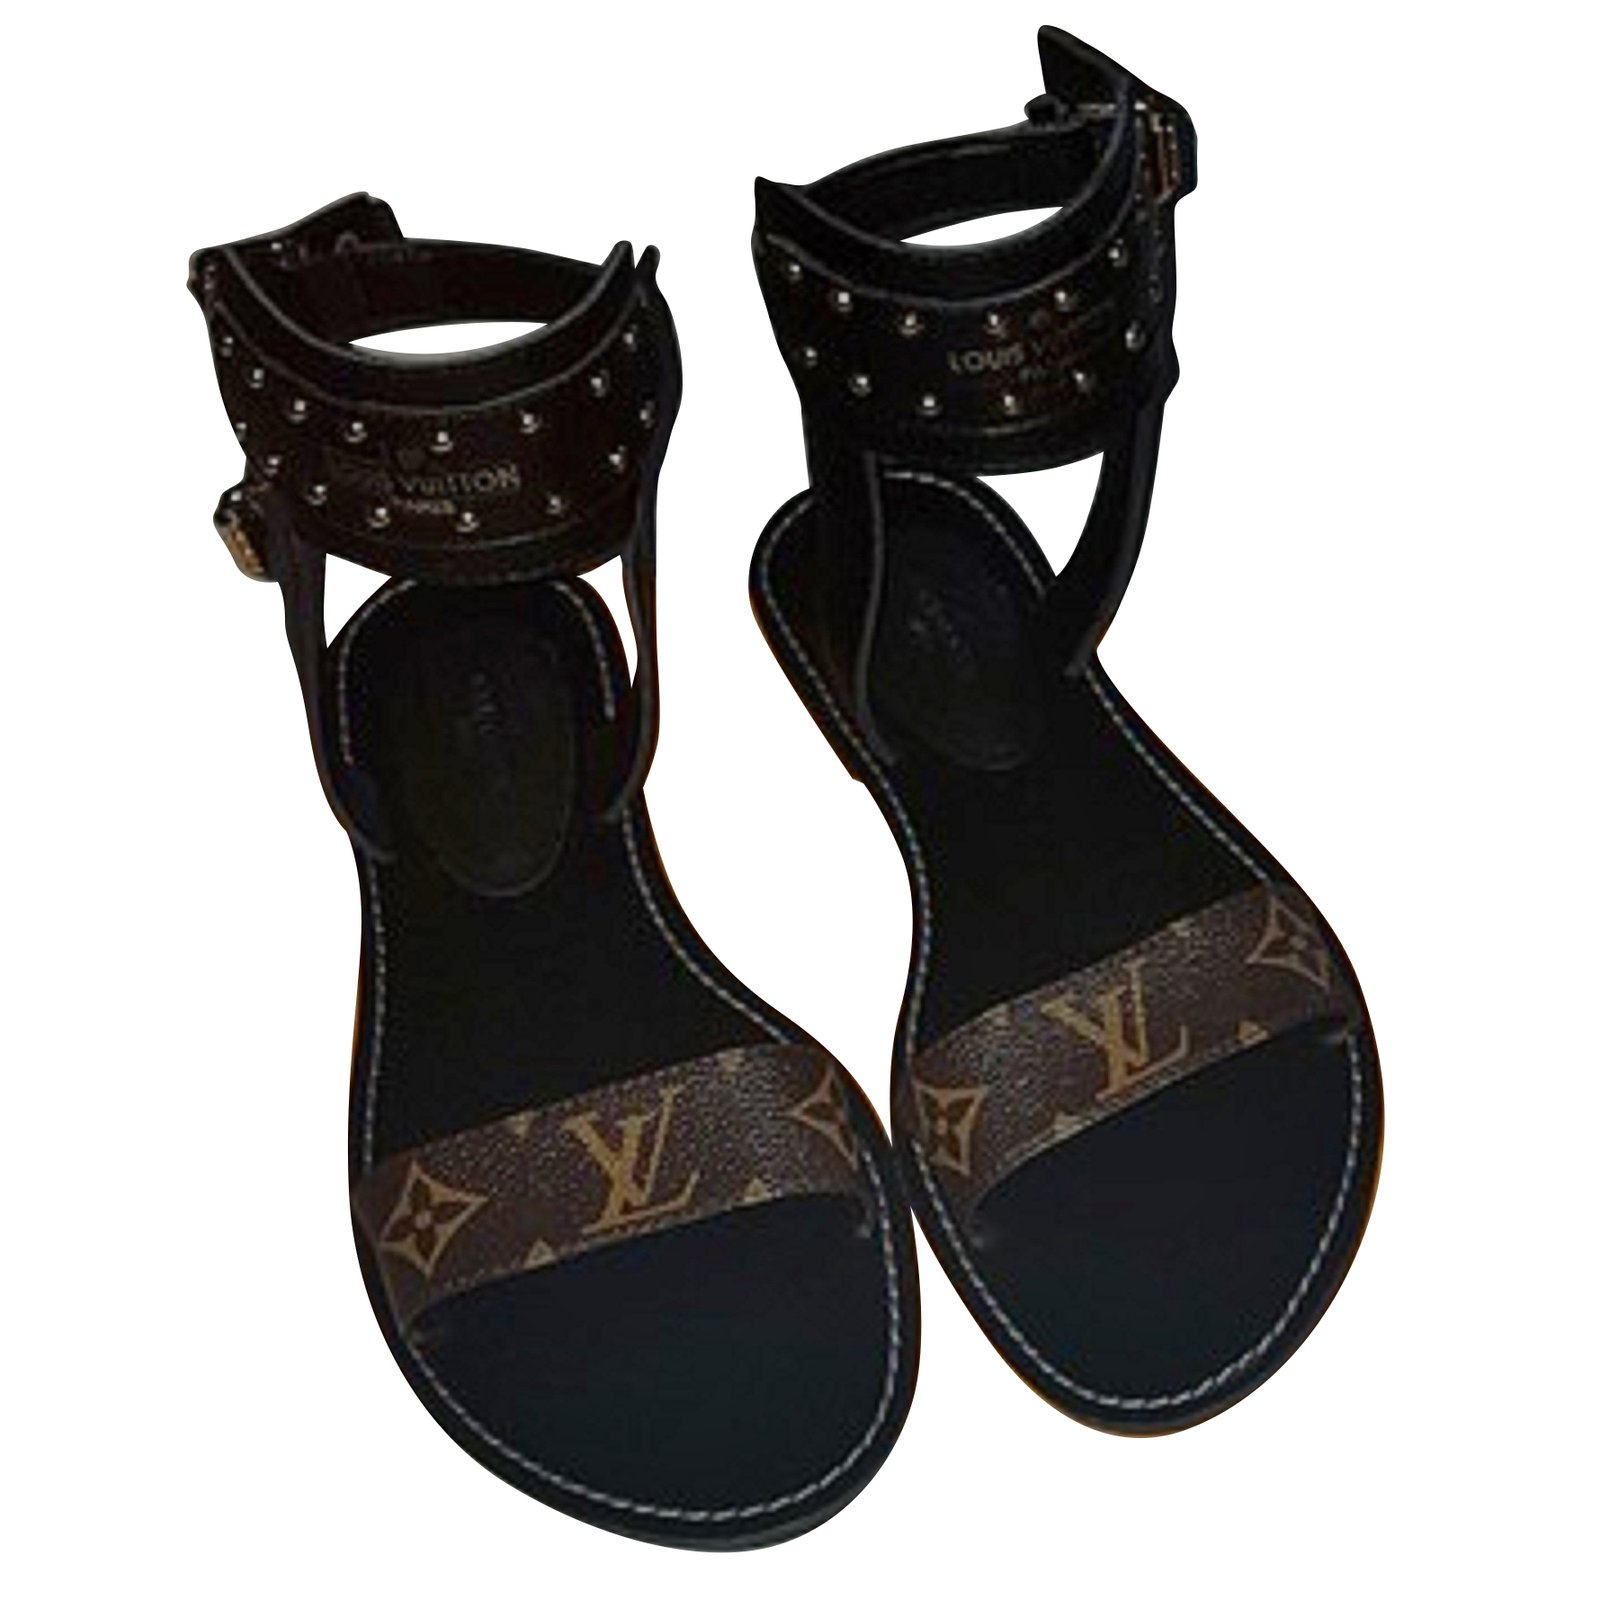 251a13afb0d Louis Vuitton NOMAD Sandals Sandals Leather Brown ref.67605 - Joli ...